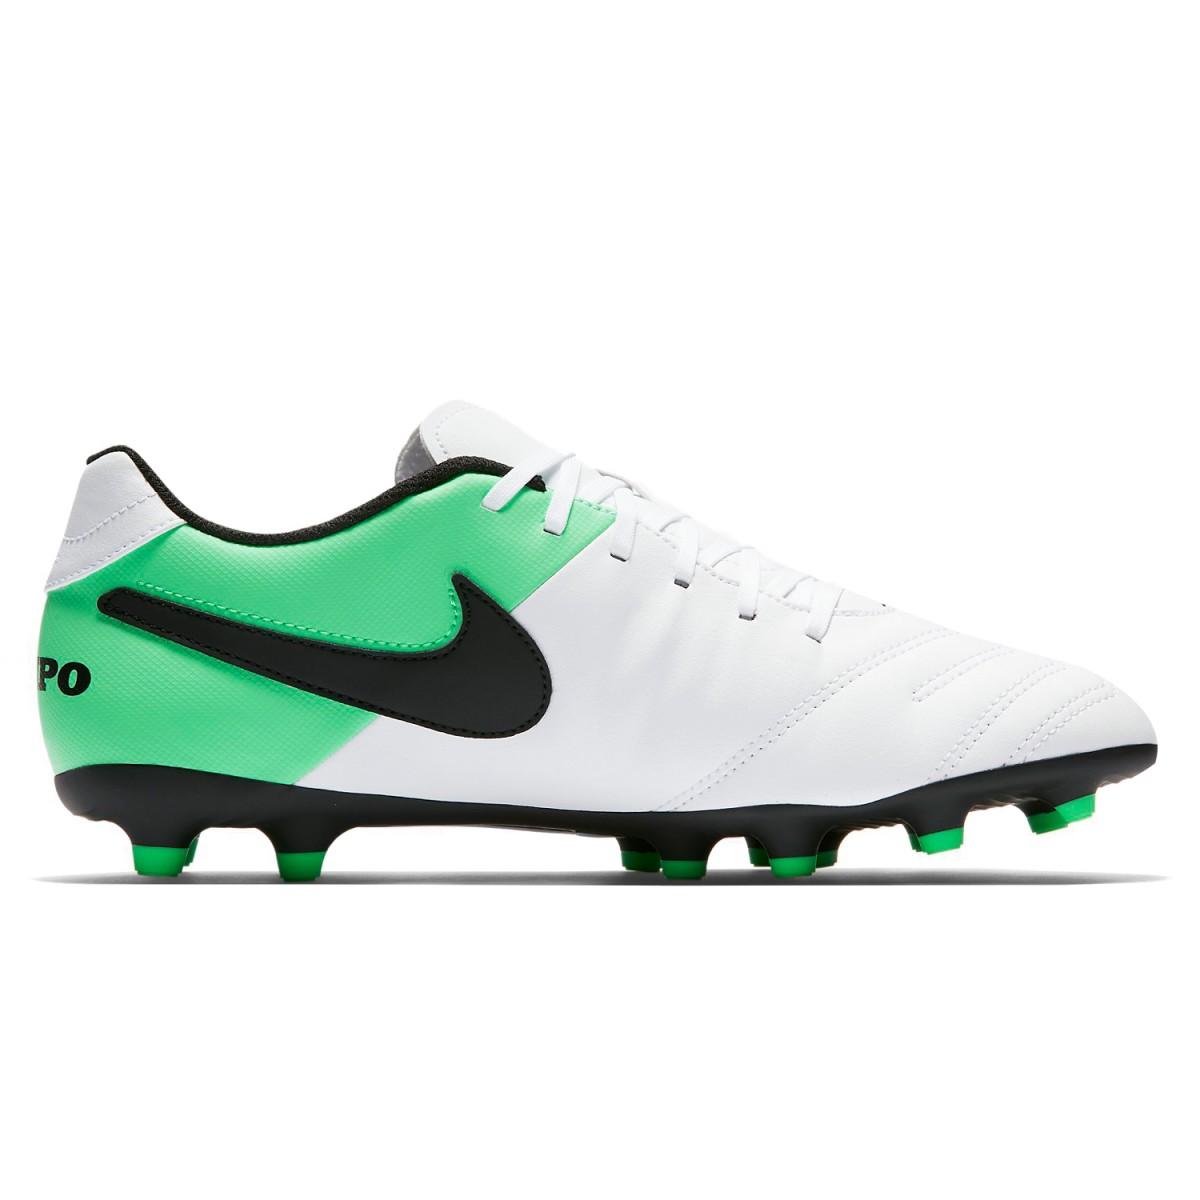 Chuteira Futebol de Campo Nike Tiempo III FG 819233 - 307 Branco